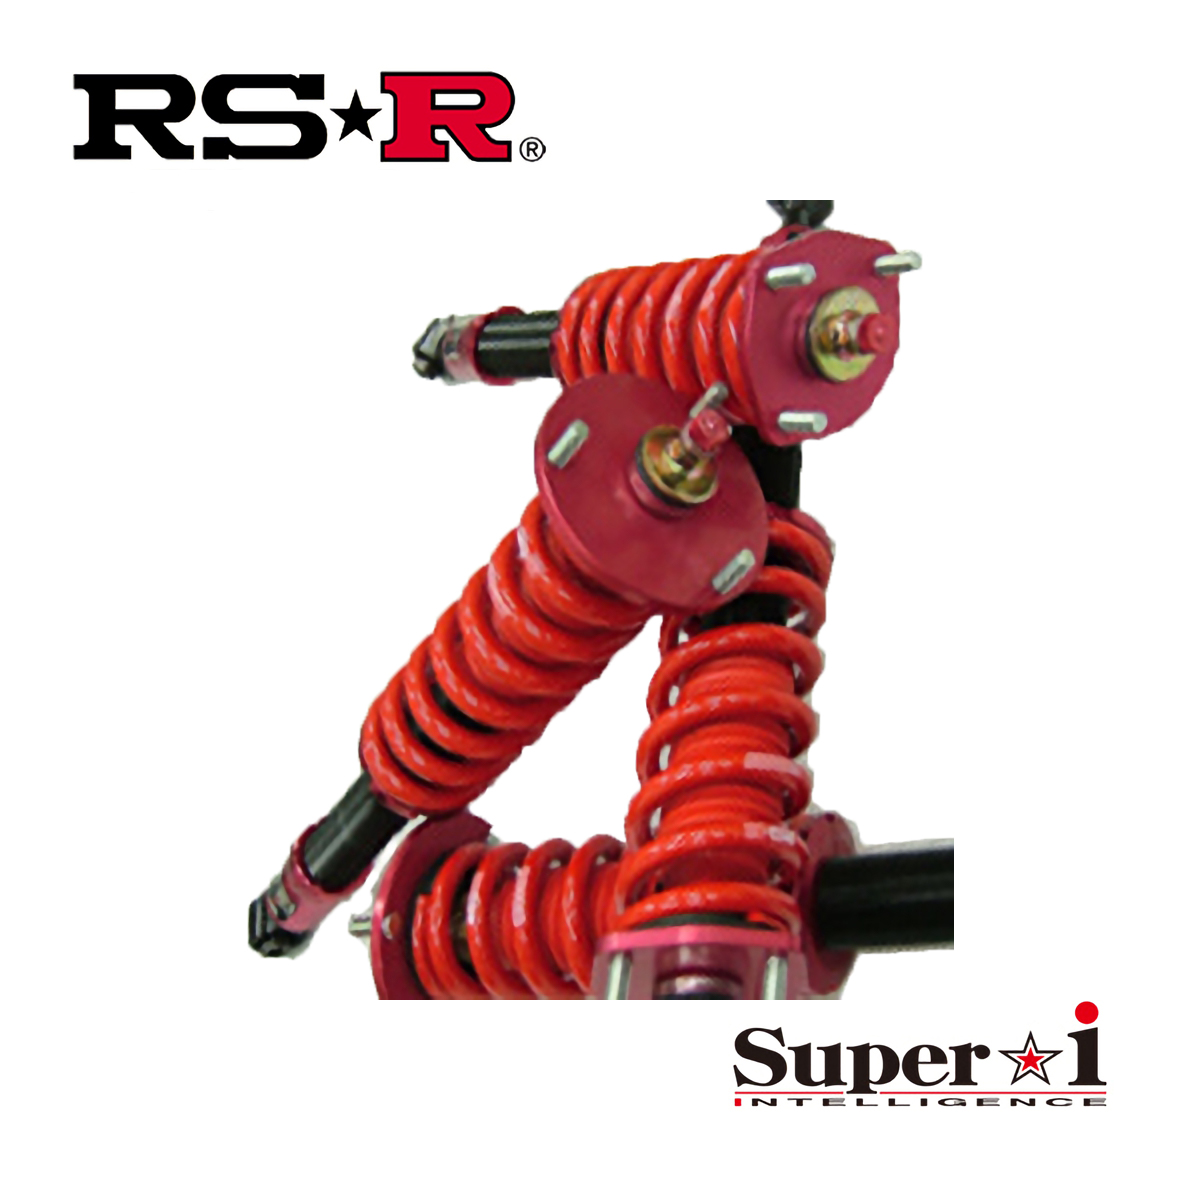 RS★R アルファード GGH25W 車高調 推奨仕様商品コード:SIT858M ソフト仕様商品コード:SIT858S ハード仕様商品コード:SIT858H RSR 条件付き送料無料